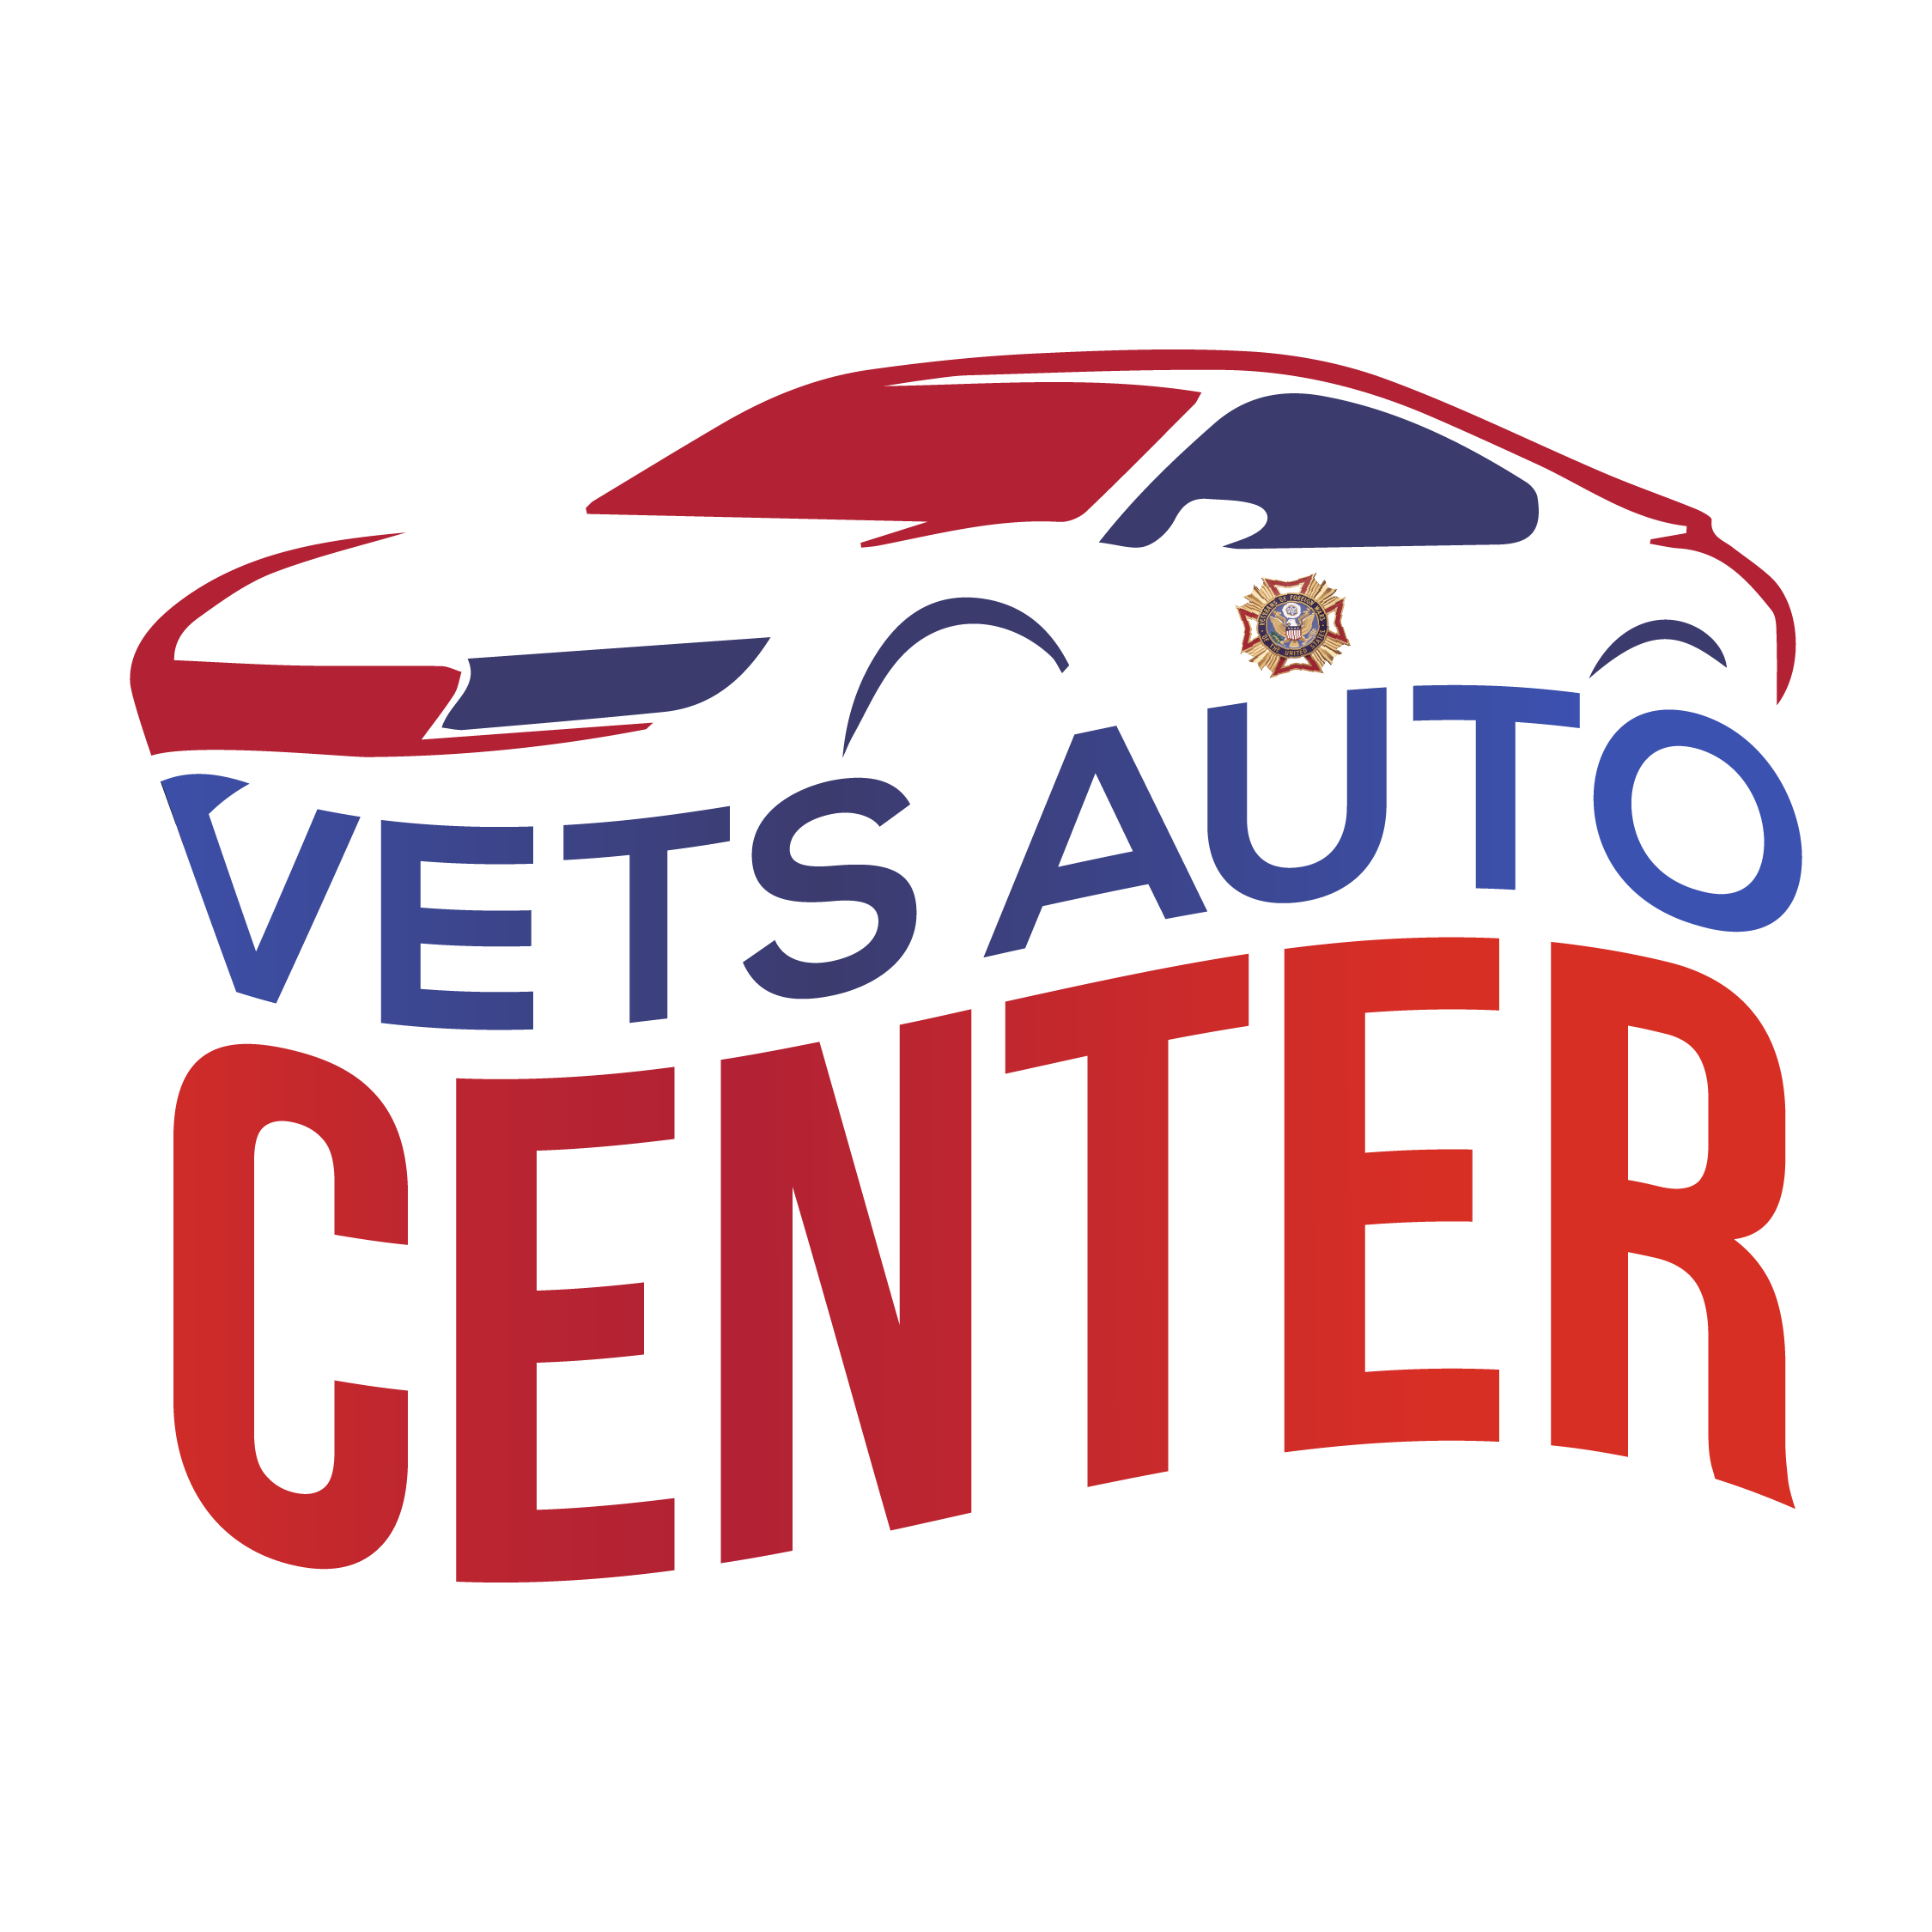 Vets Auto Center Logo Design in Austin